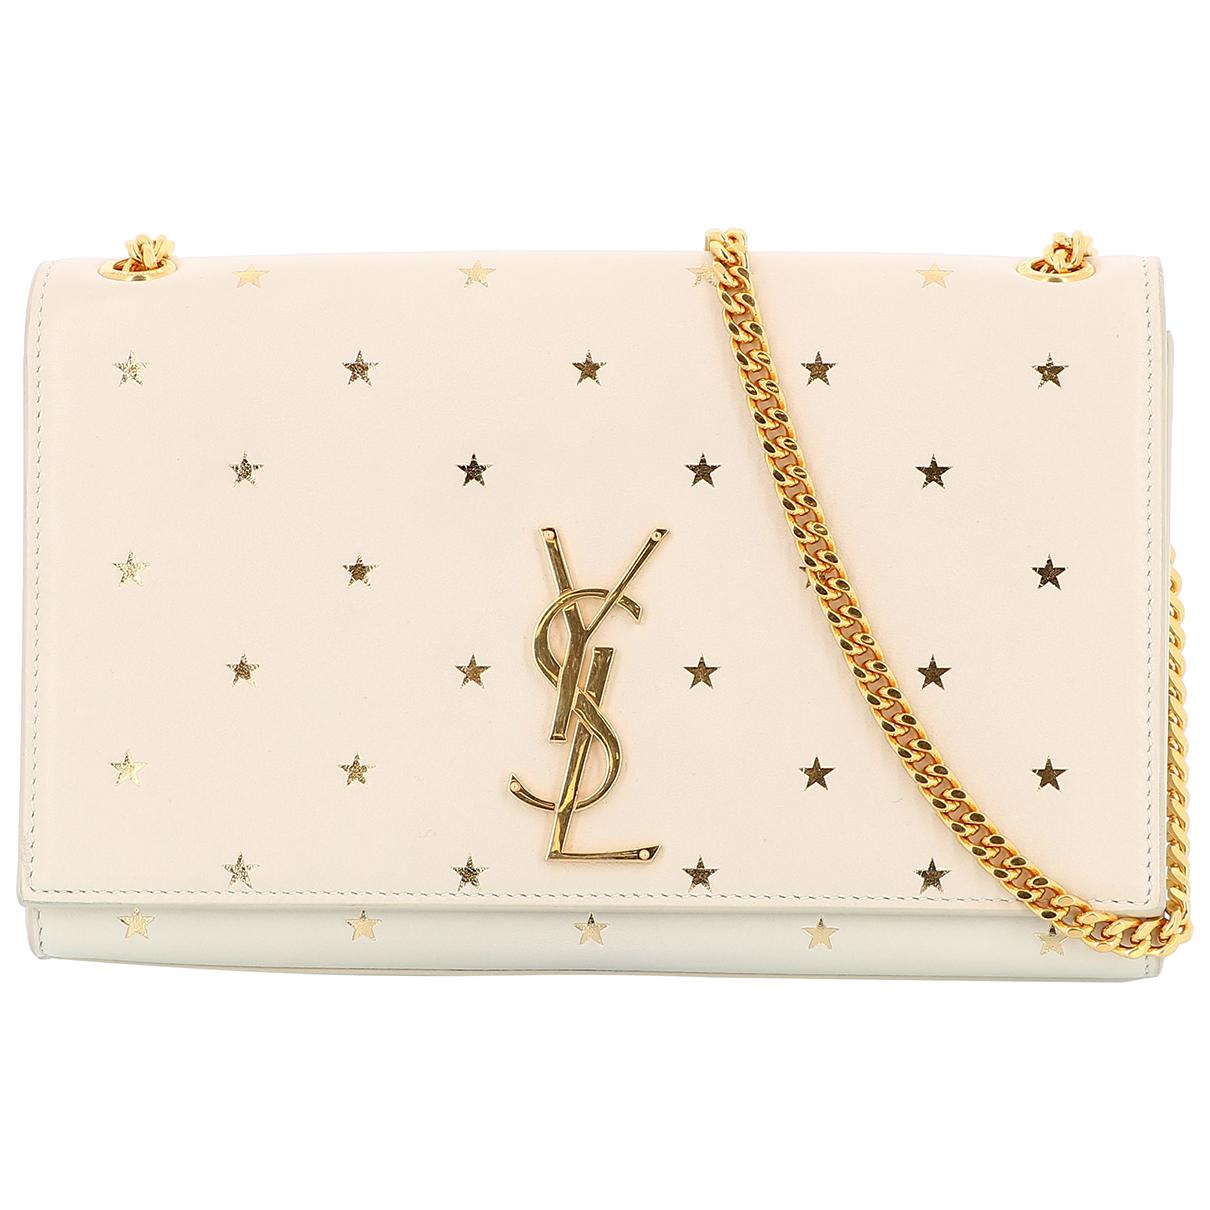 Saint Laurent Kate monogramme Handtasche in  Weiss Leder